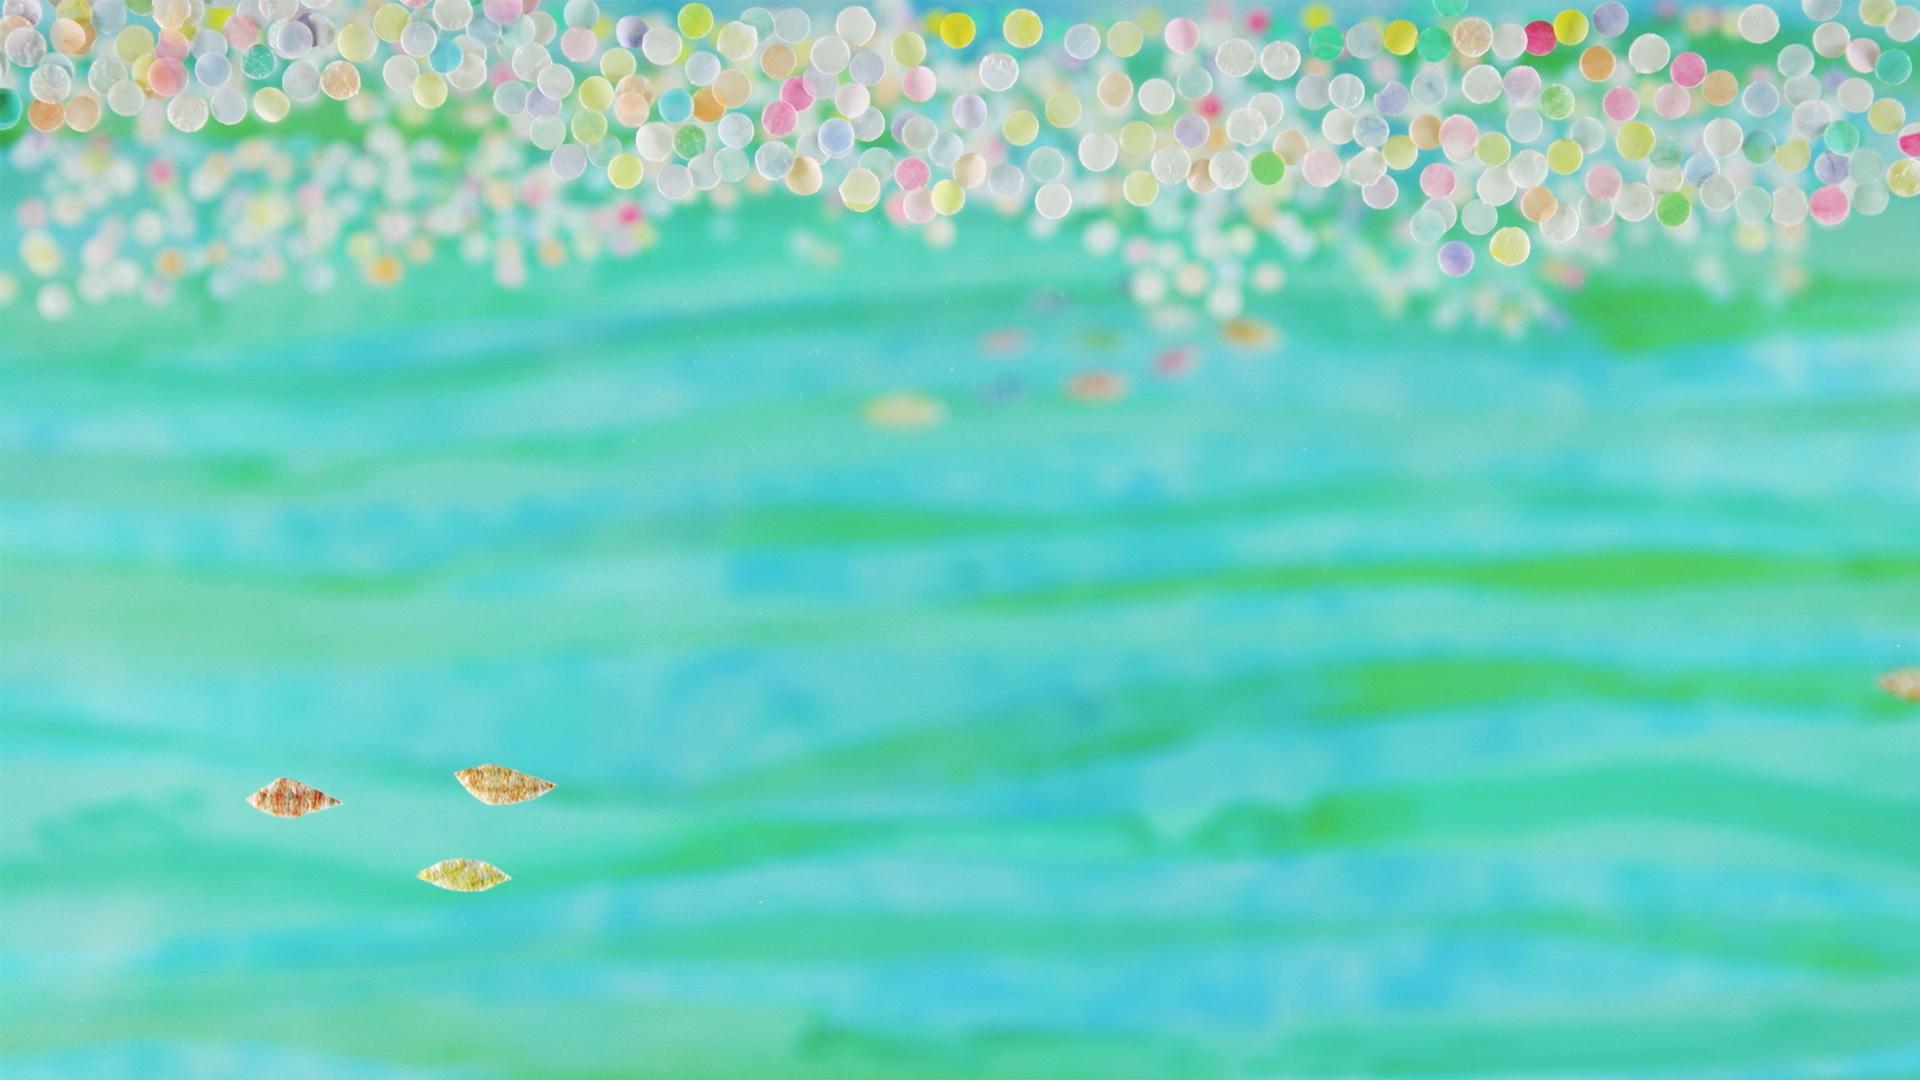 jardin movil, poster, miniseries, animation, films for babies, preschool, stop motion